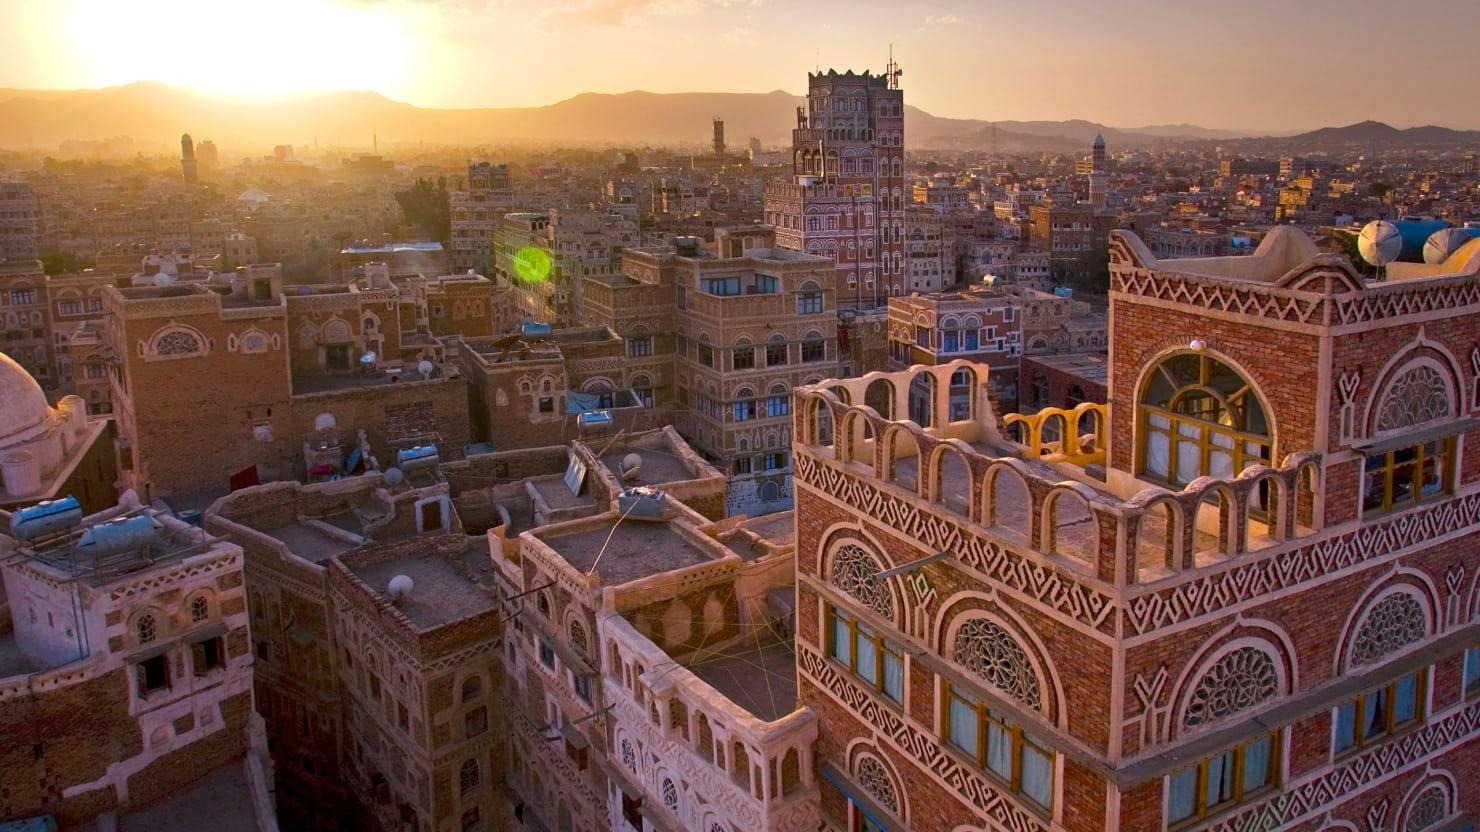 150926-pell-yemen-tease_kz1rvq